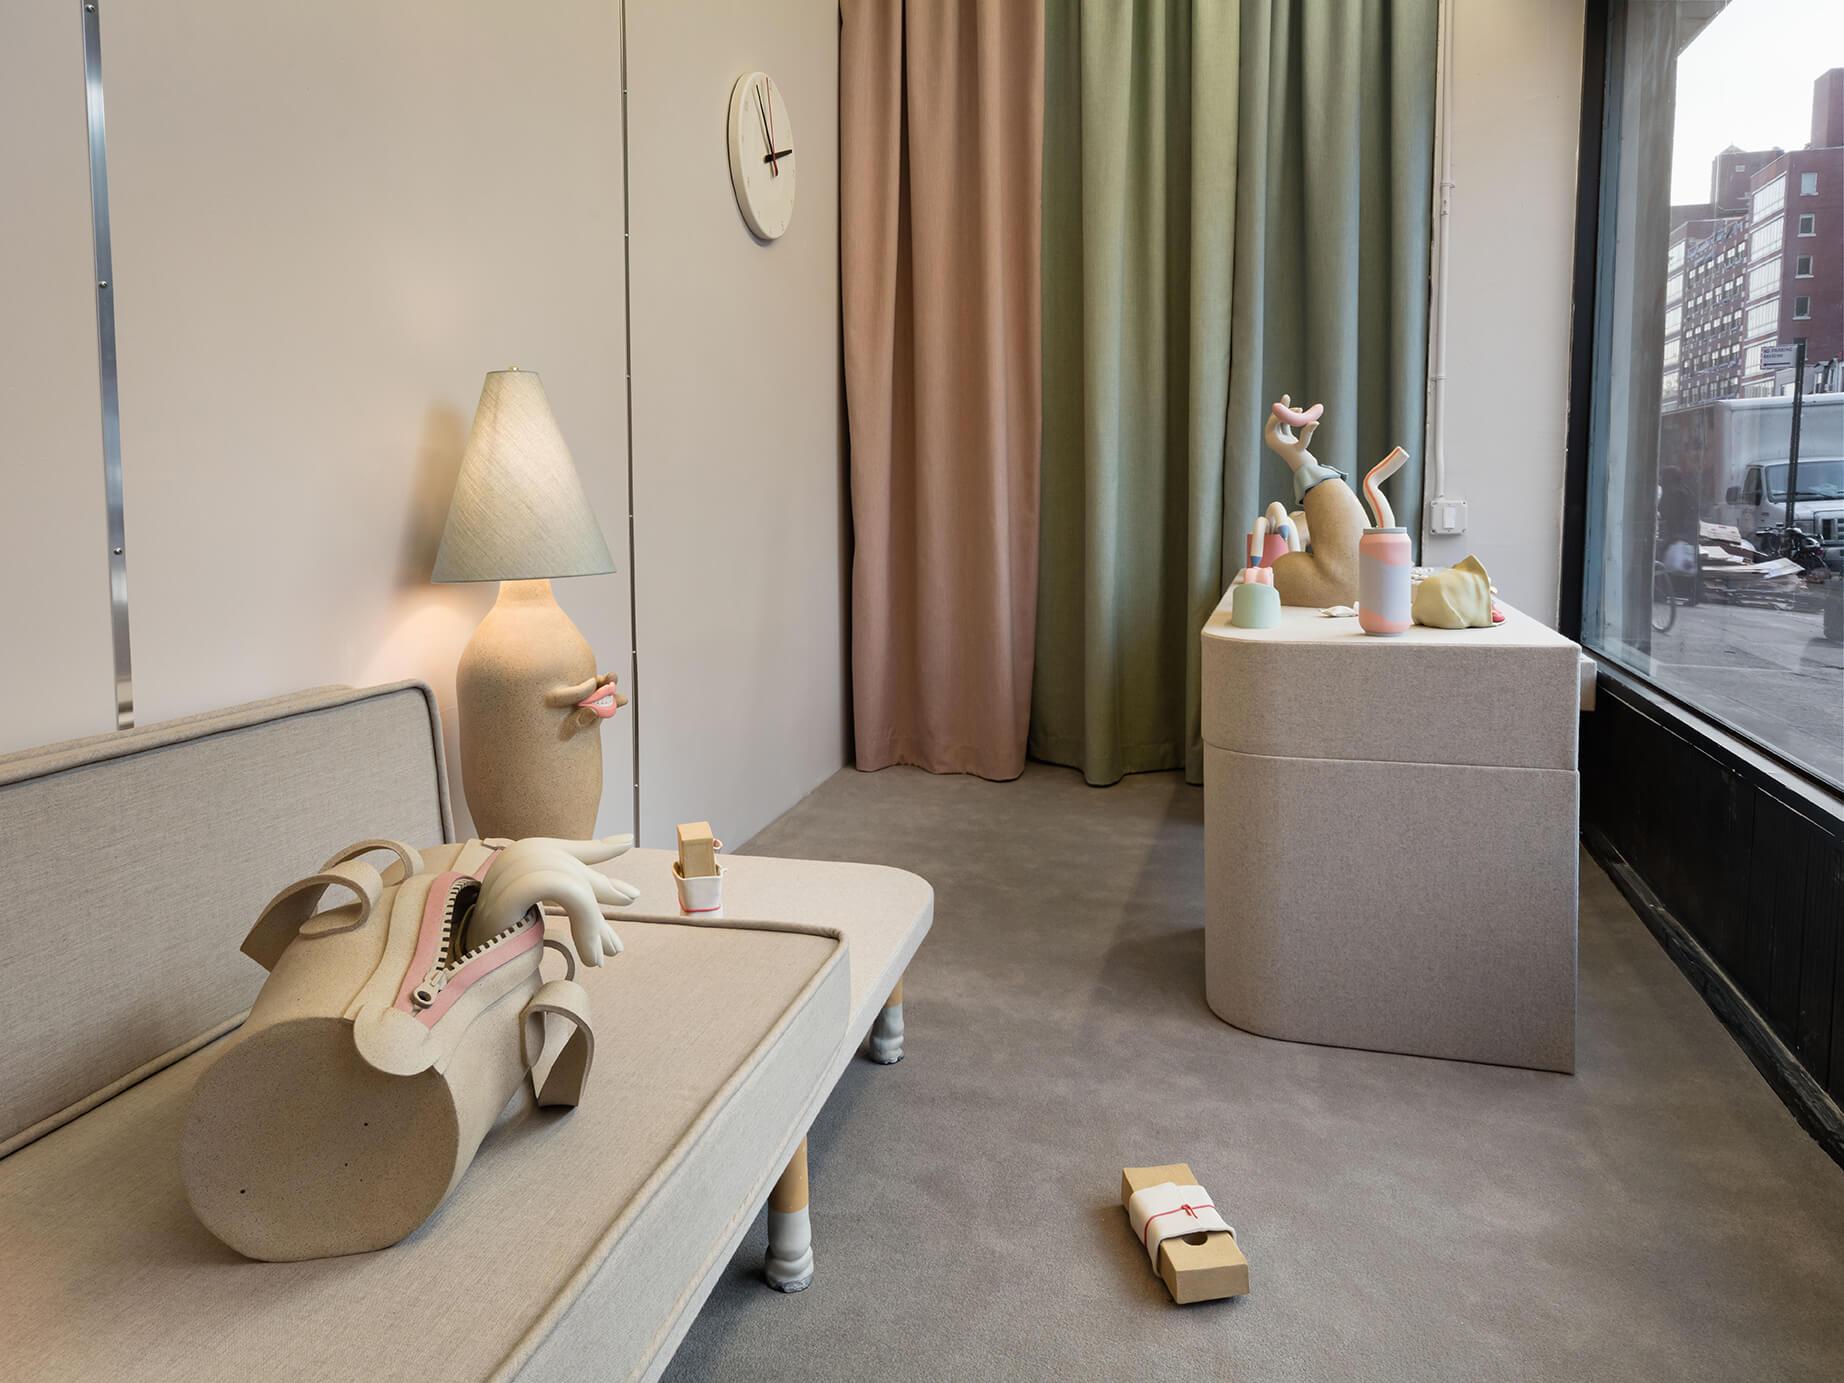 genesis-belanger-new_museum_b